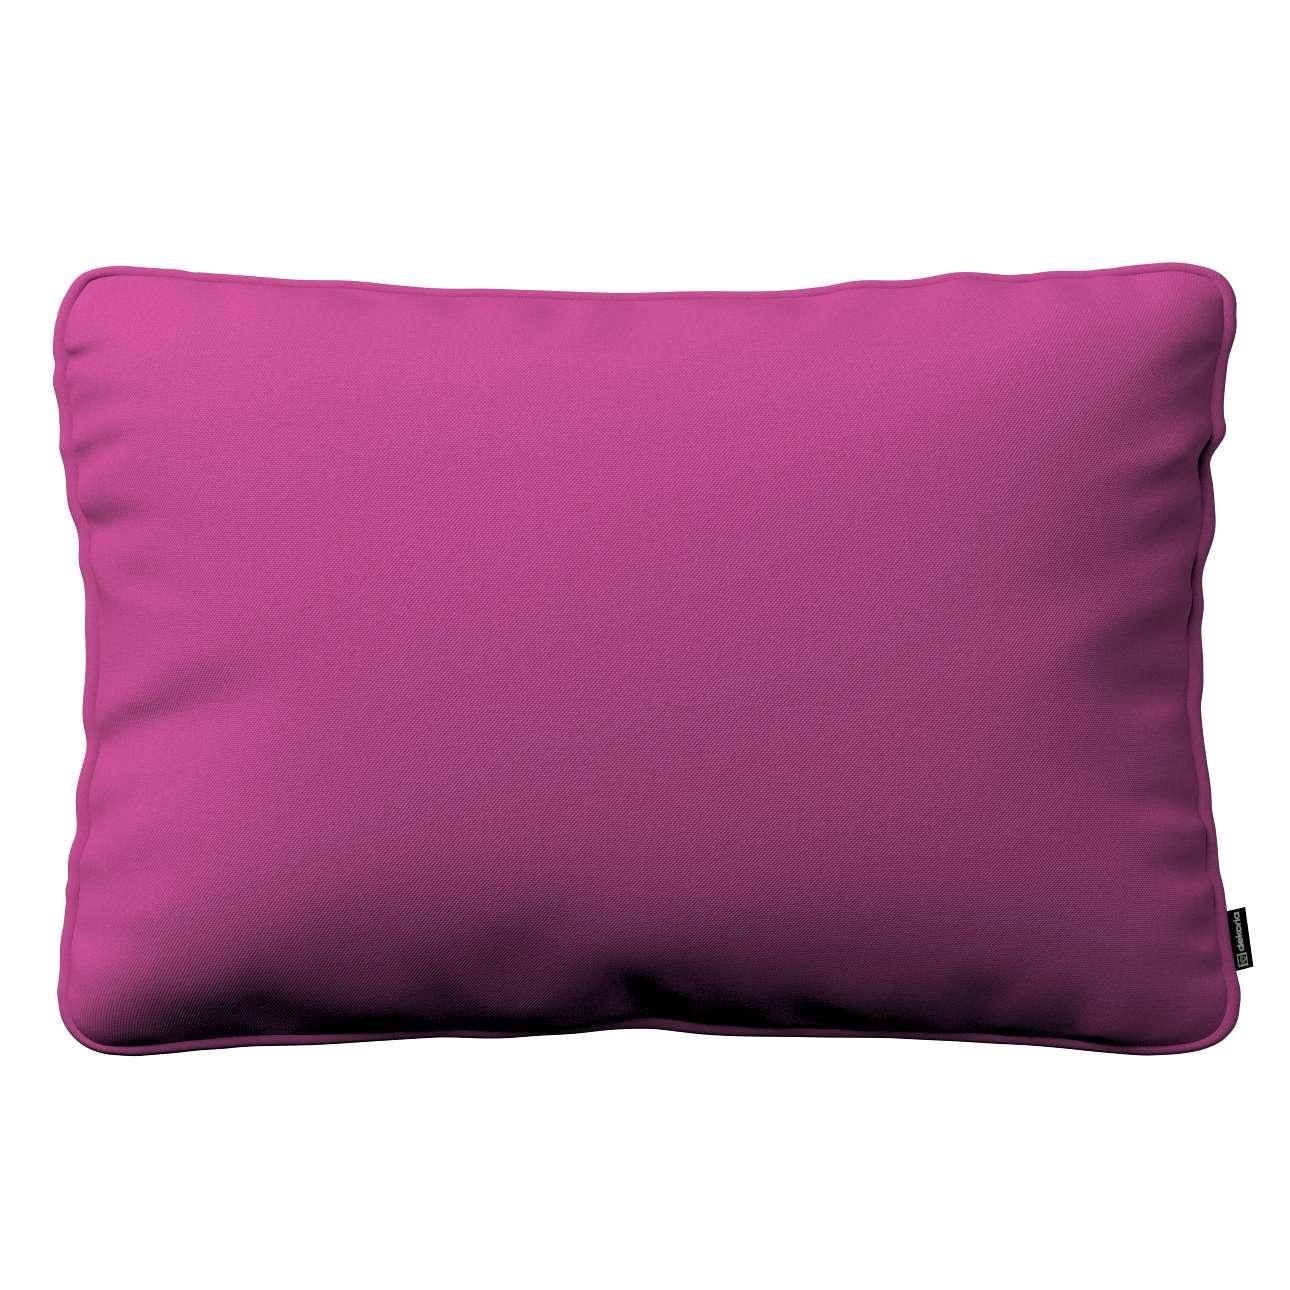 Kissenhülle Gabi mit Paspel 60x40cm, amarant, 60 × 40 cm, Etna | Heimtextilien > Bettwäsche und Laken > Kopfkissenbezüge | Dekoria